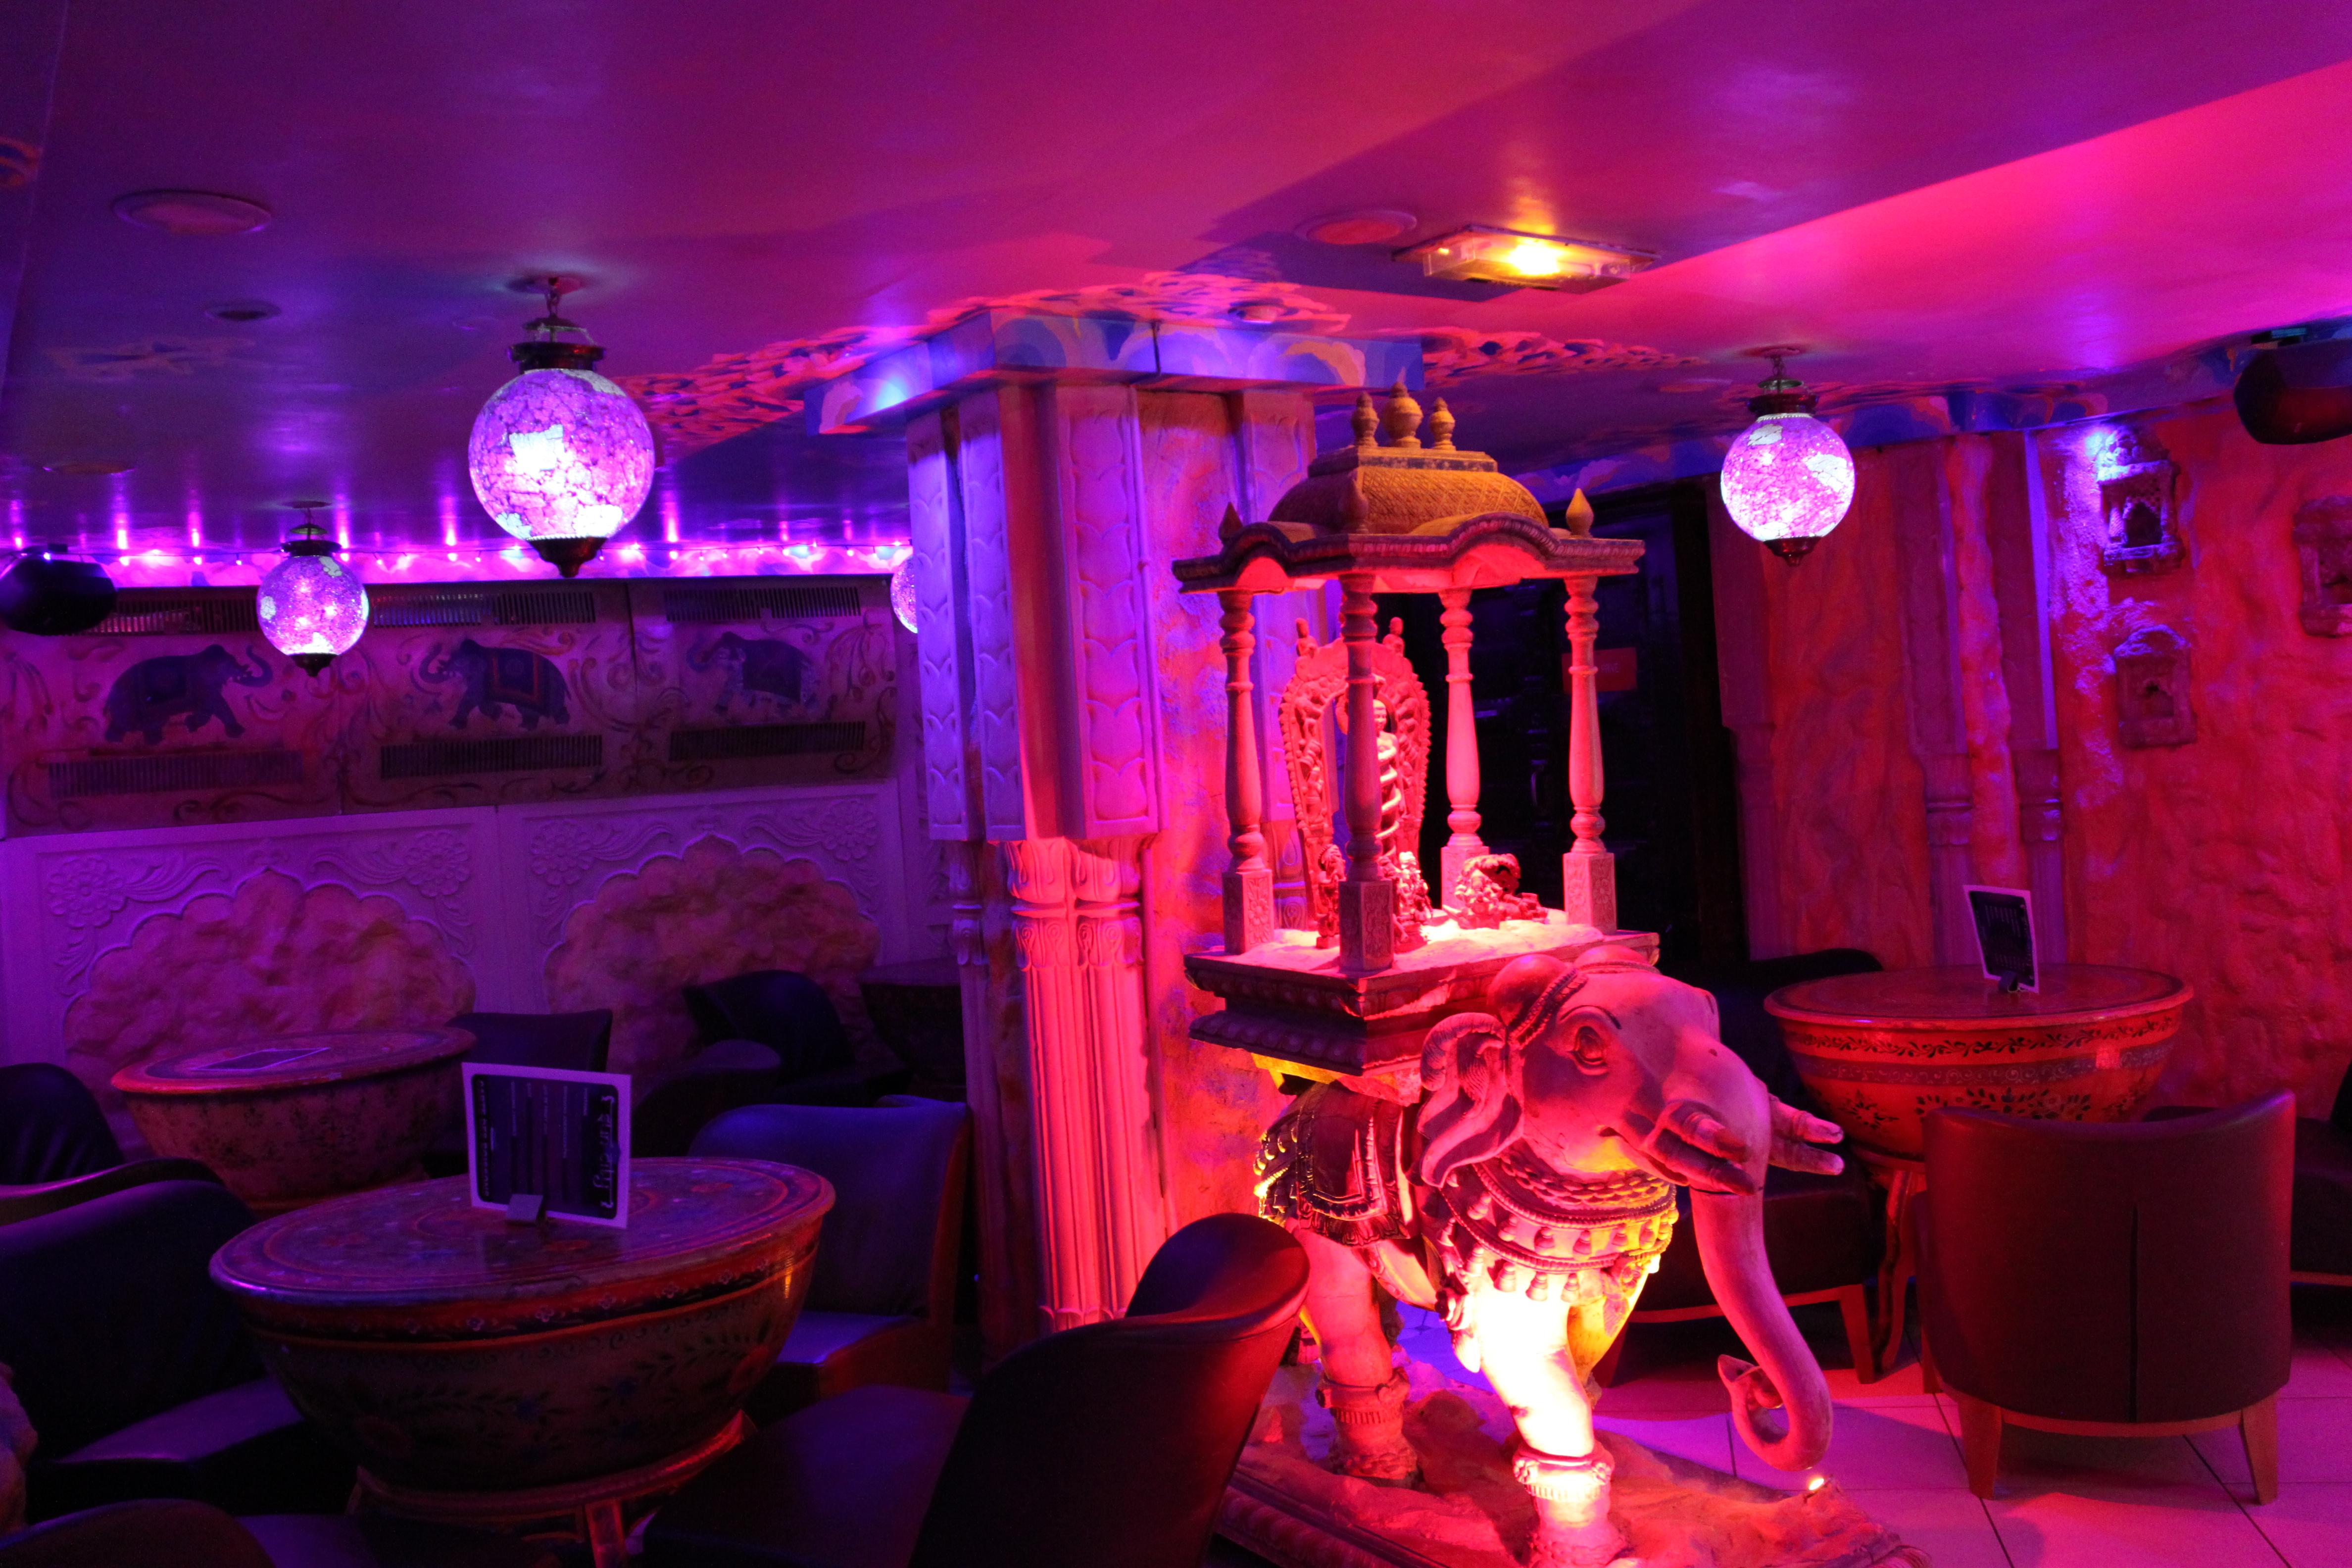 Cinema & Bar - SunCity sauna gay Paris